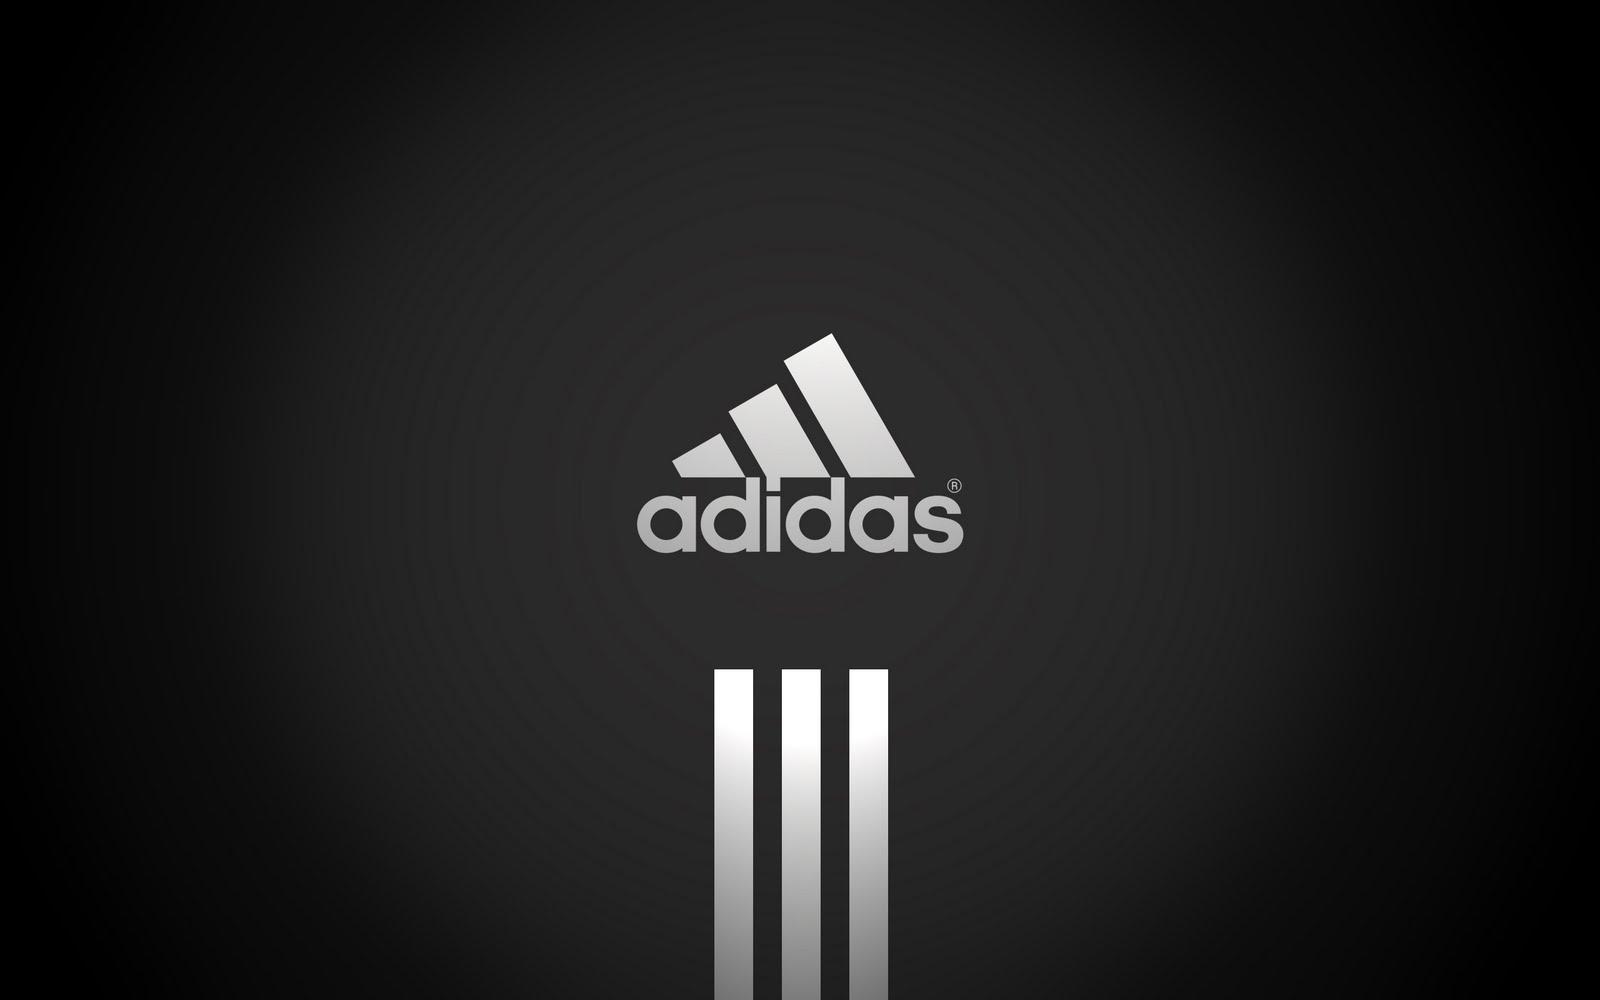 Adidas Logo HD Wallpapers Desktop Wallpapers 1600x1000